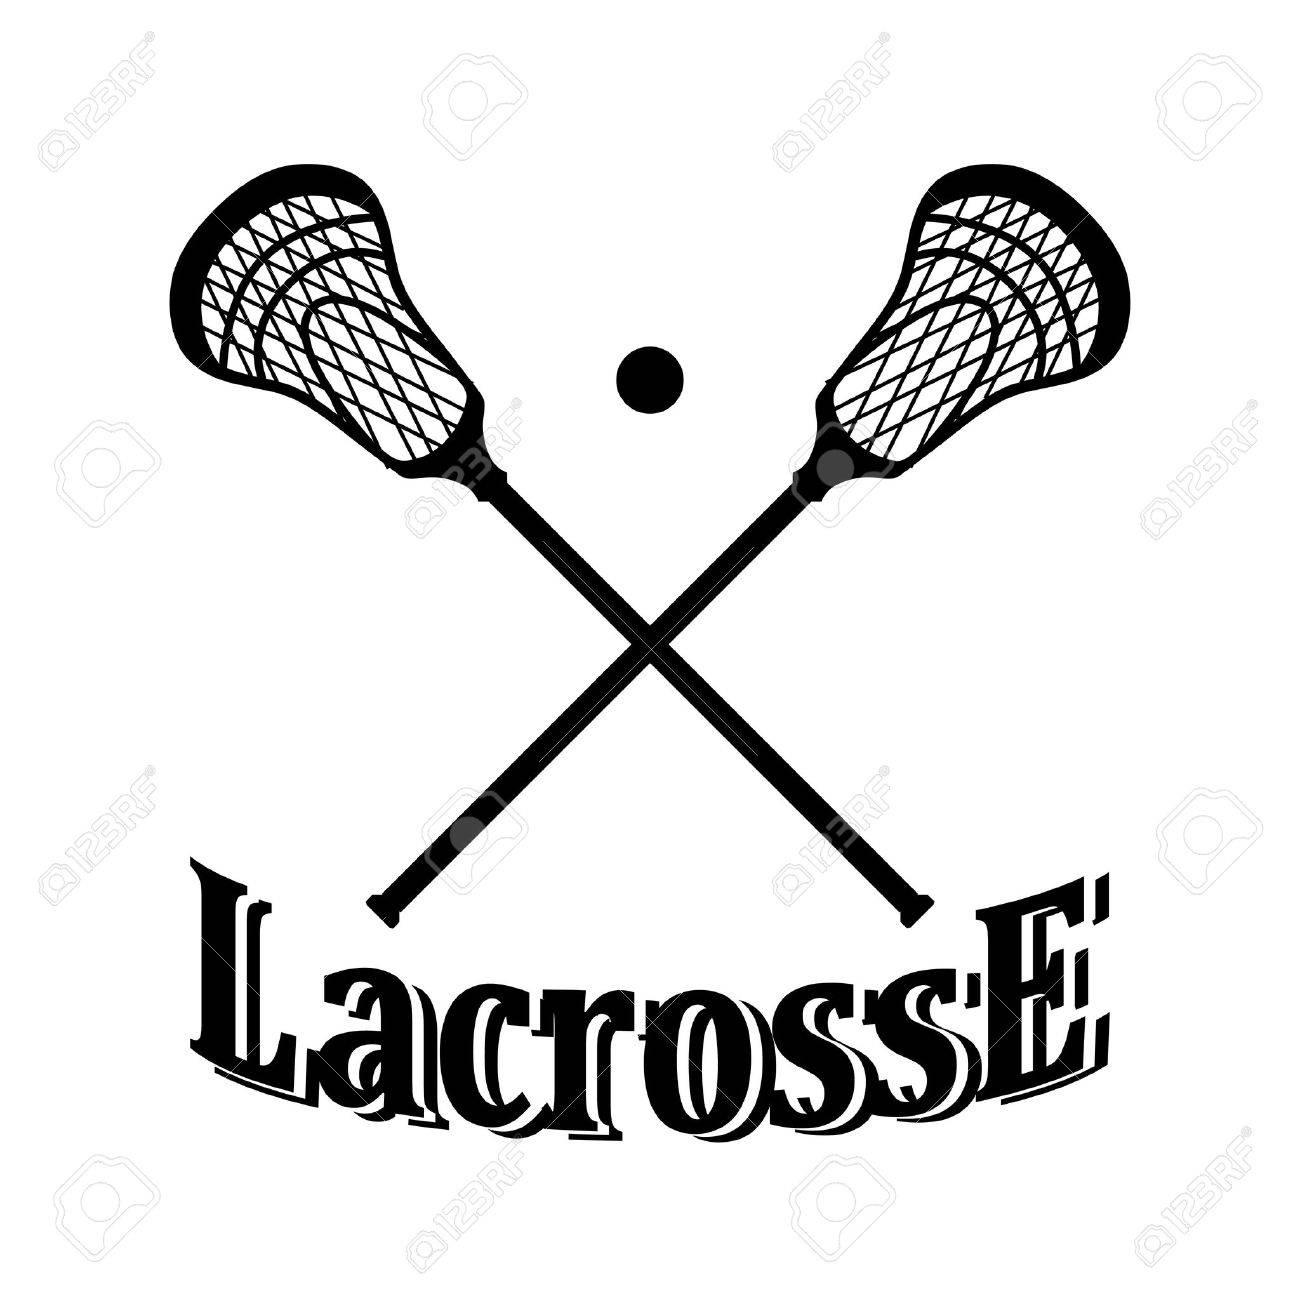 197 Lacrosse Stick free clipart.